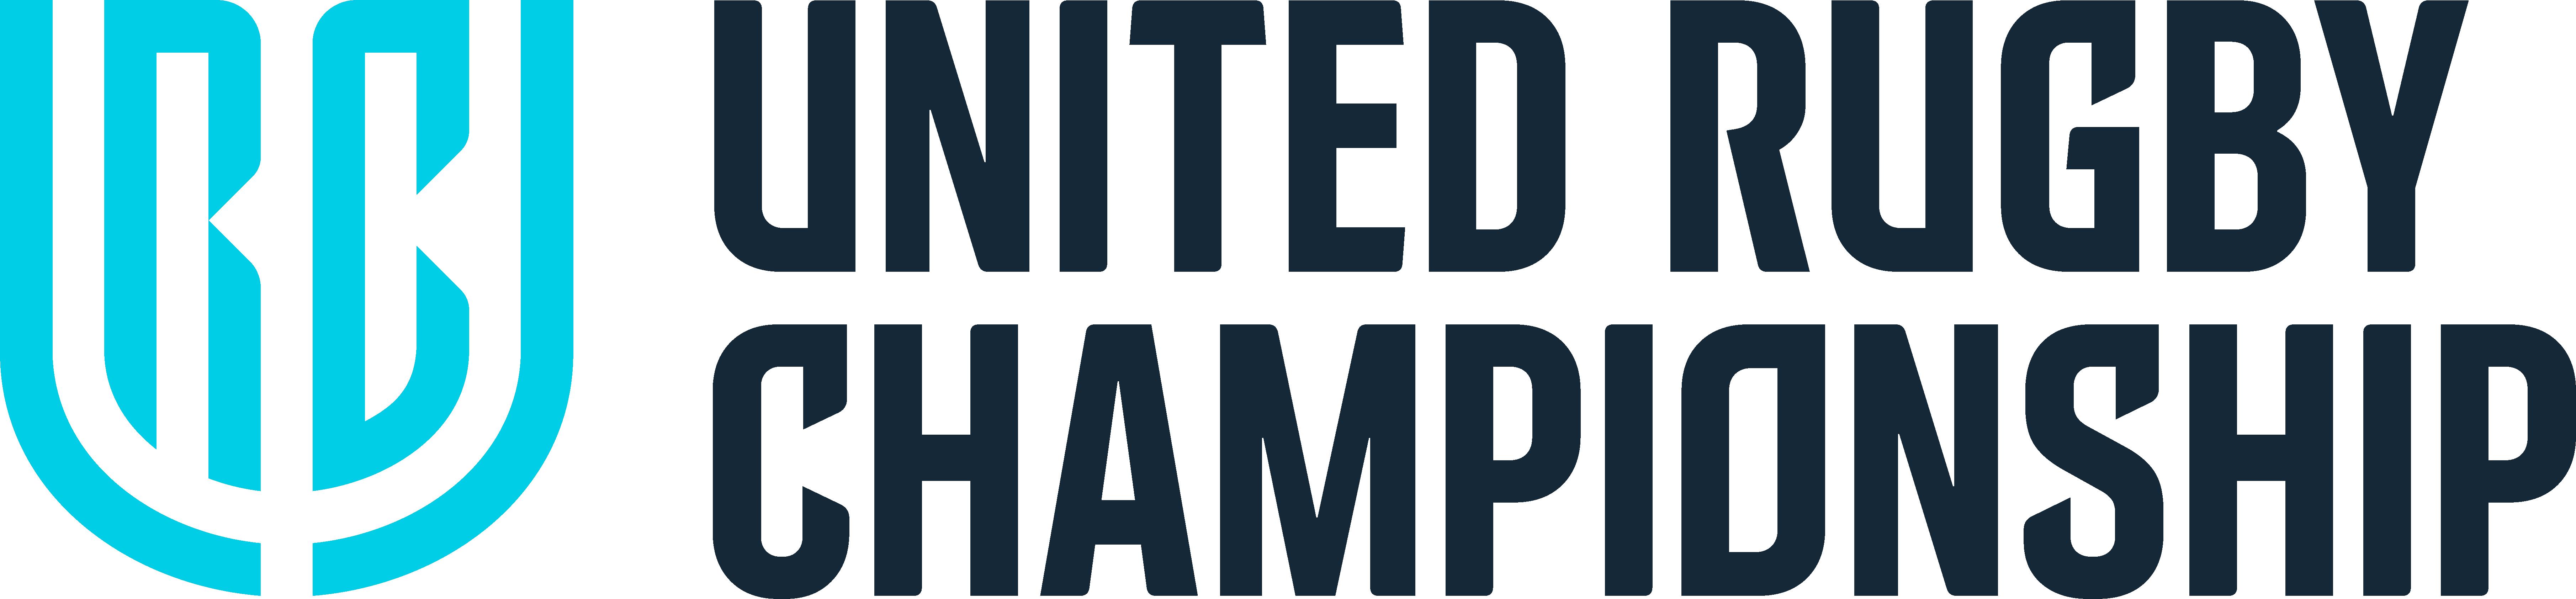 rugby URC logo blue symbol black type